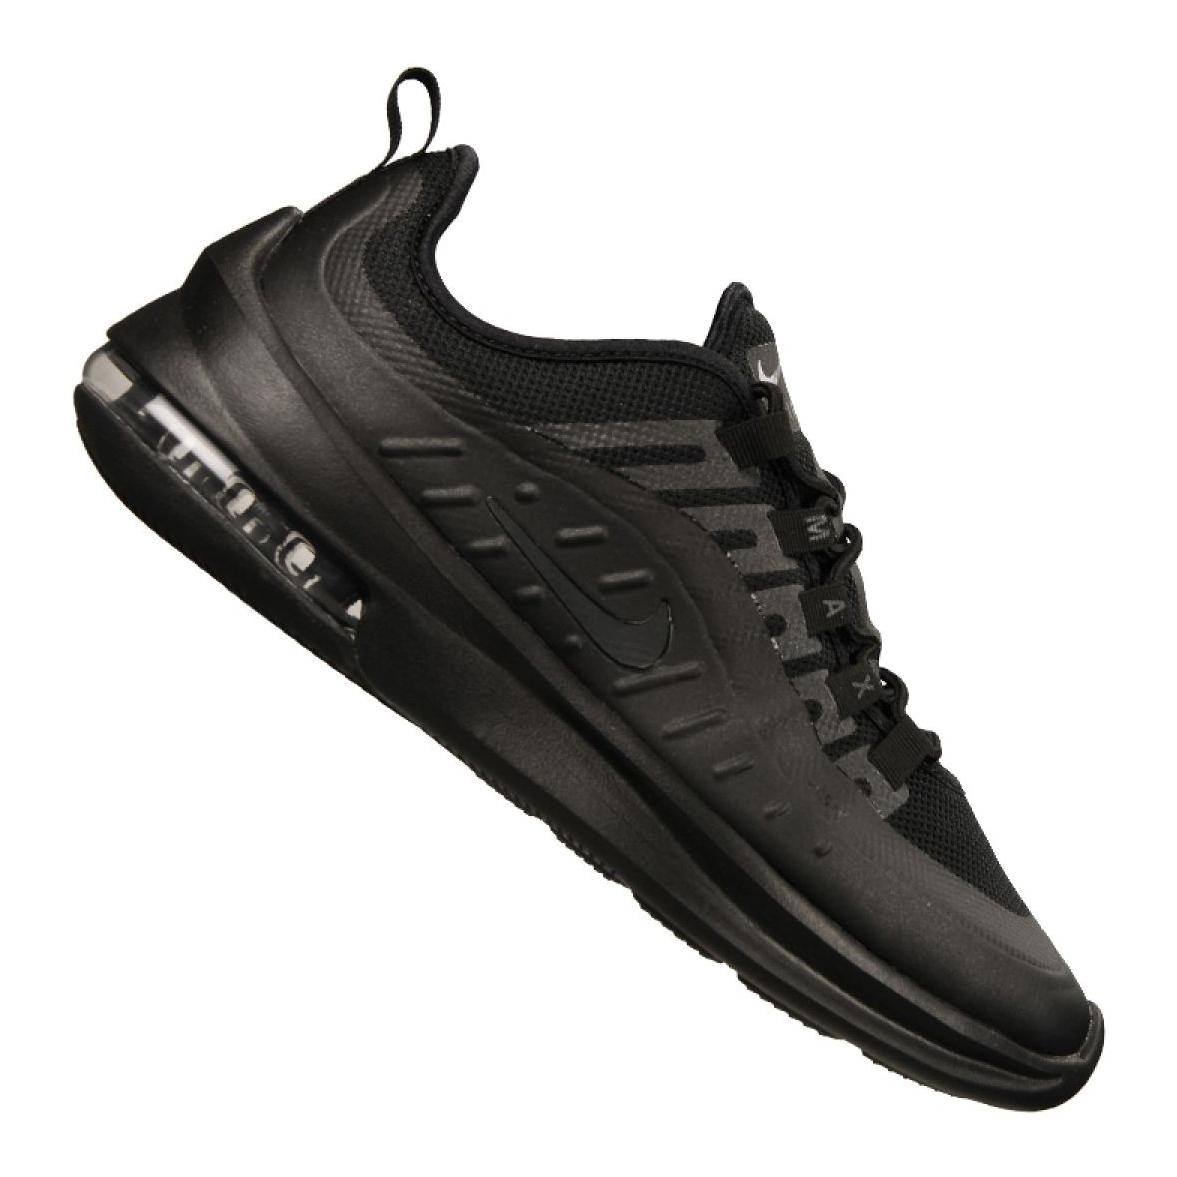 Details zu Schuhe Nike Air Max Axis Herren AA2146 008